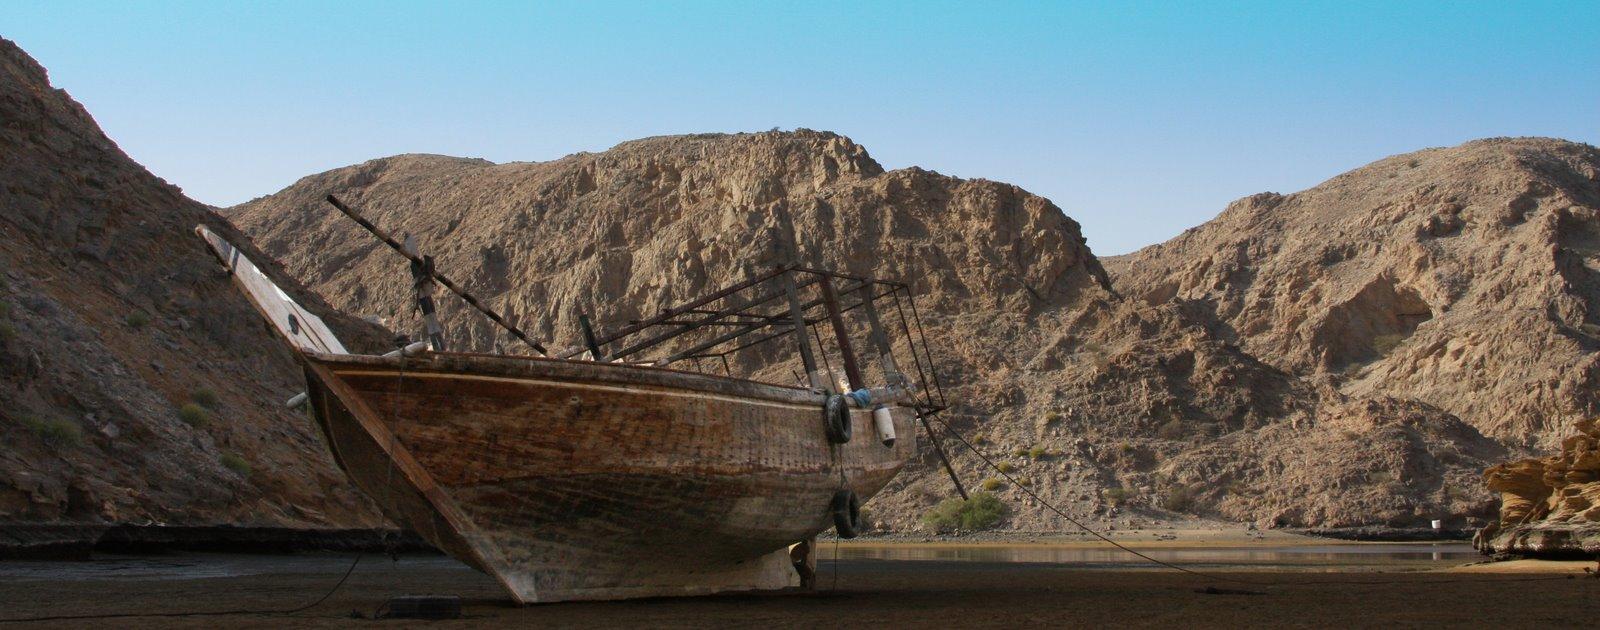 [boat3.jpe]